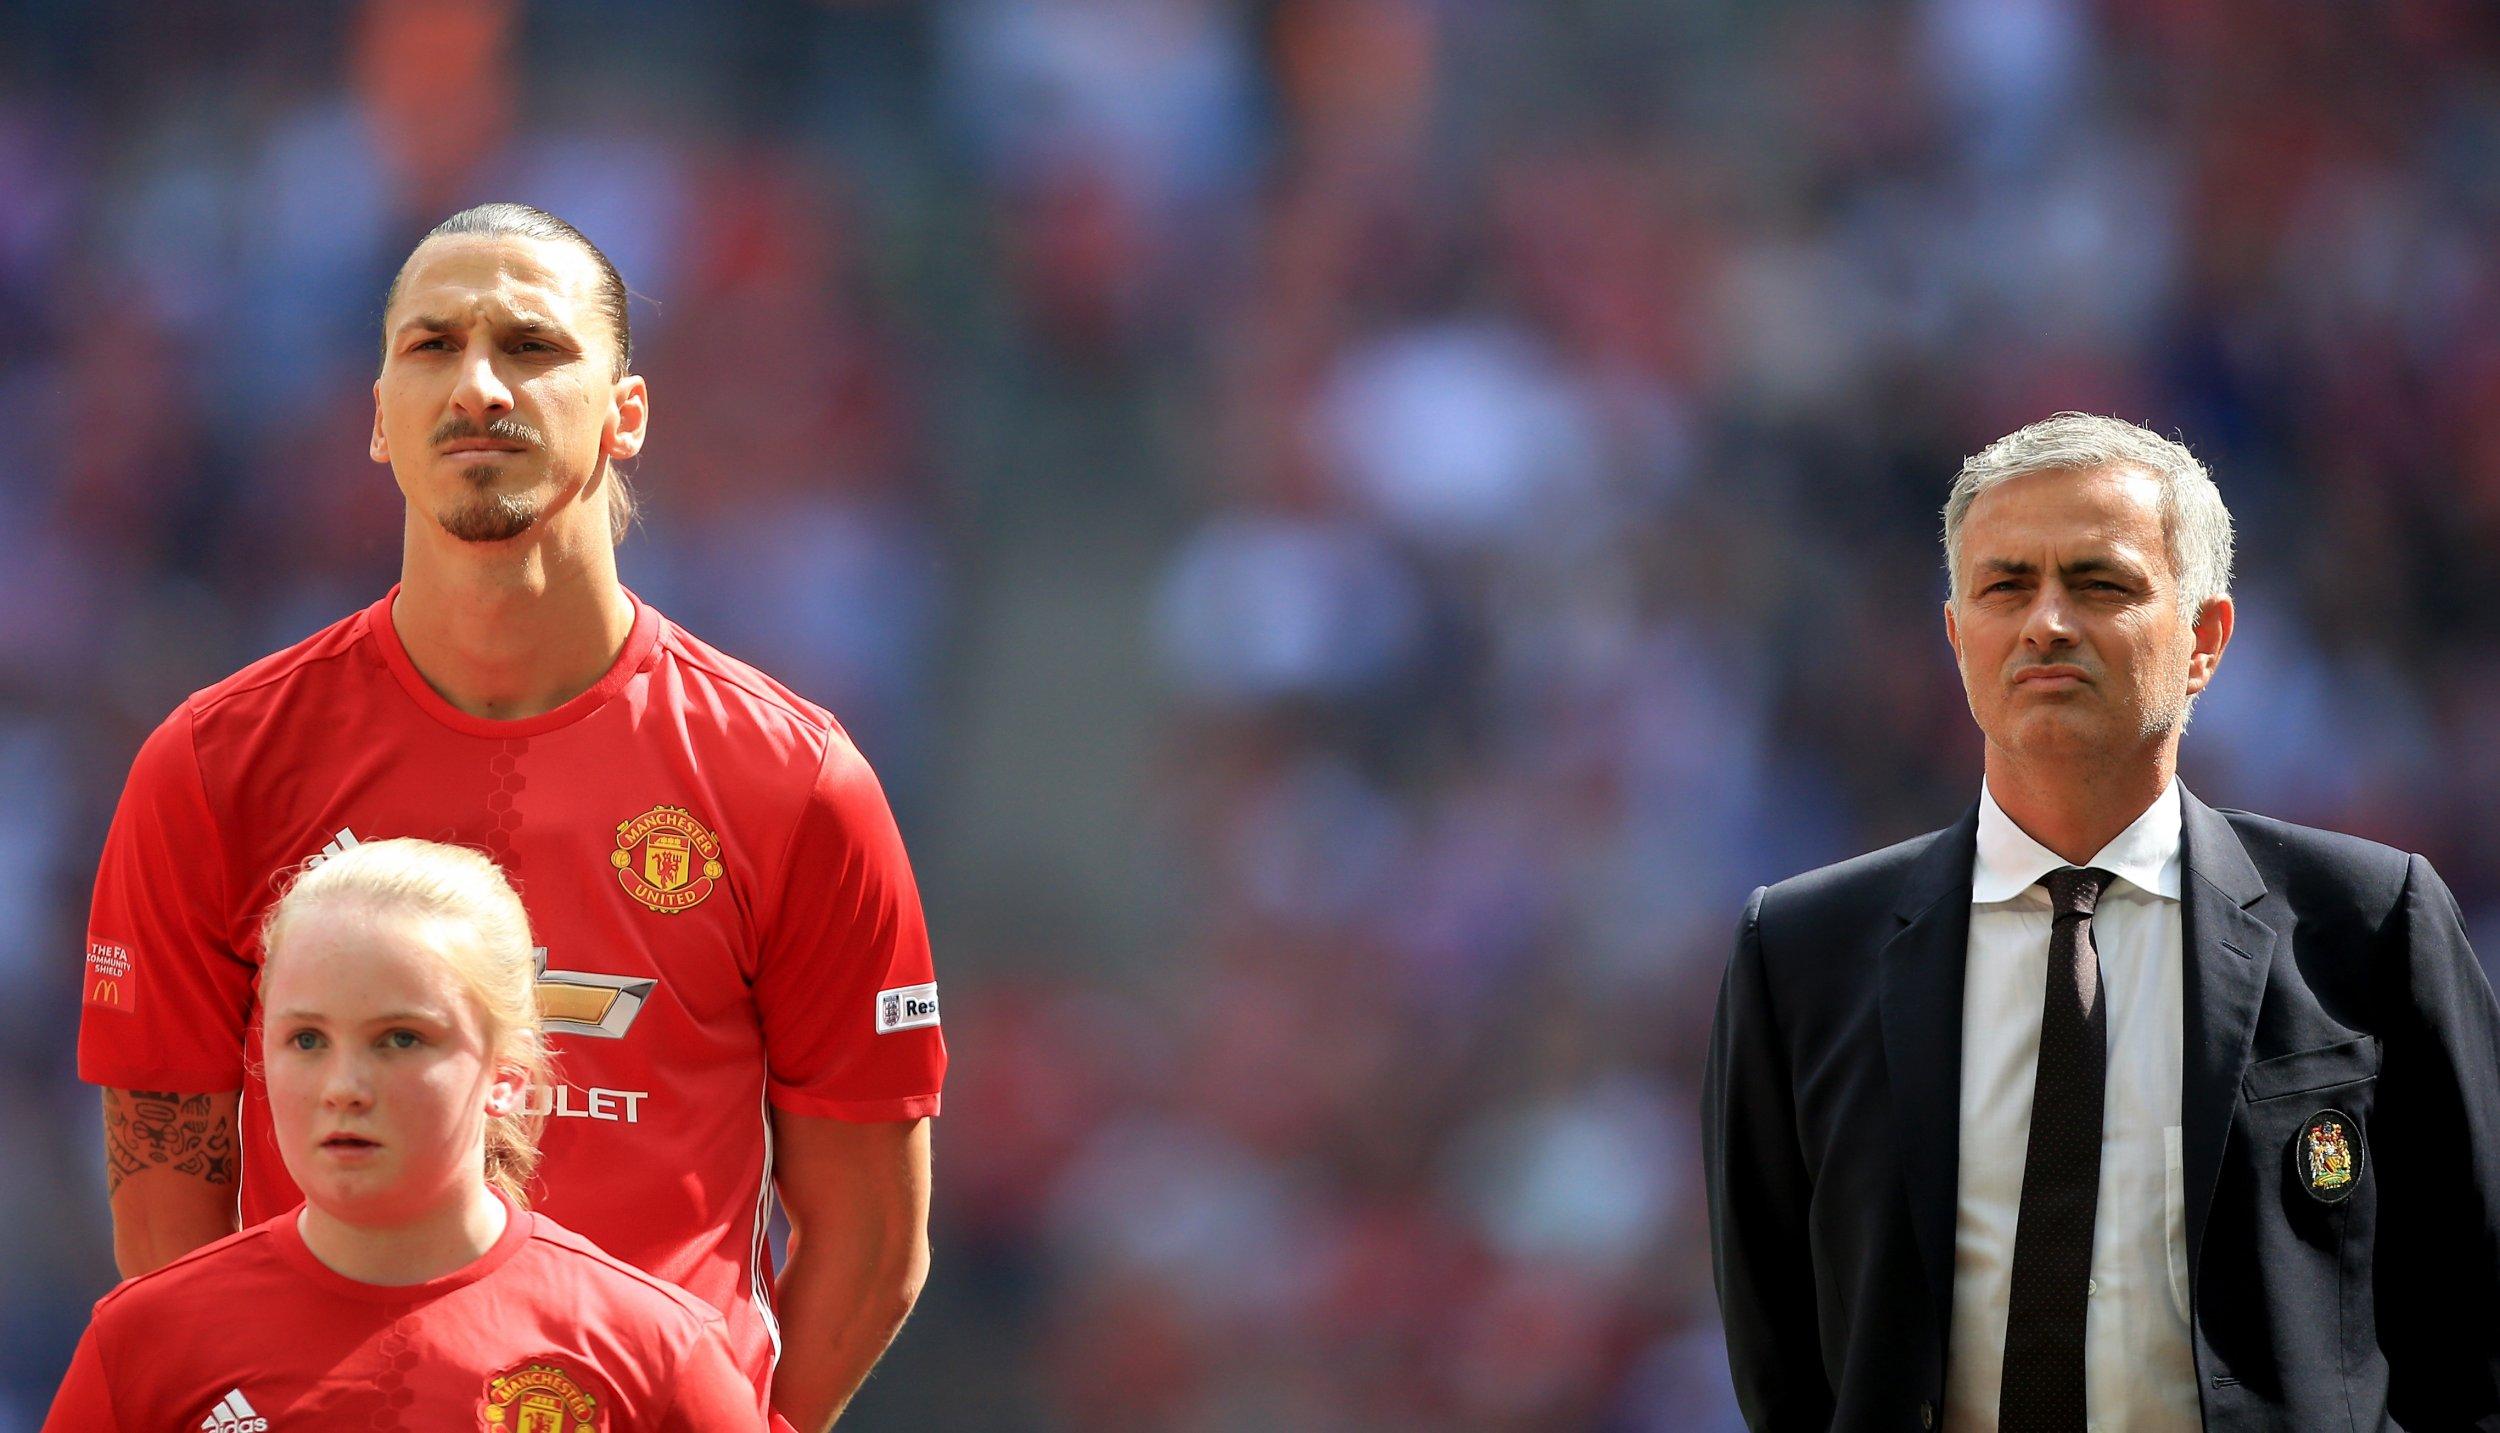 Zlatan Ibrahimovic, left, with Manchester United manager Jose Mourinho.